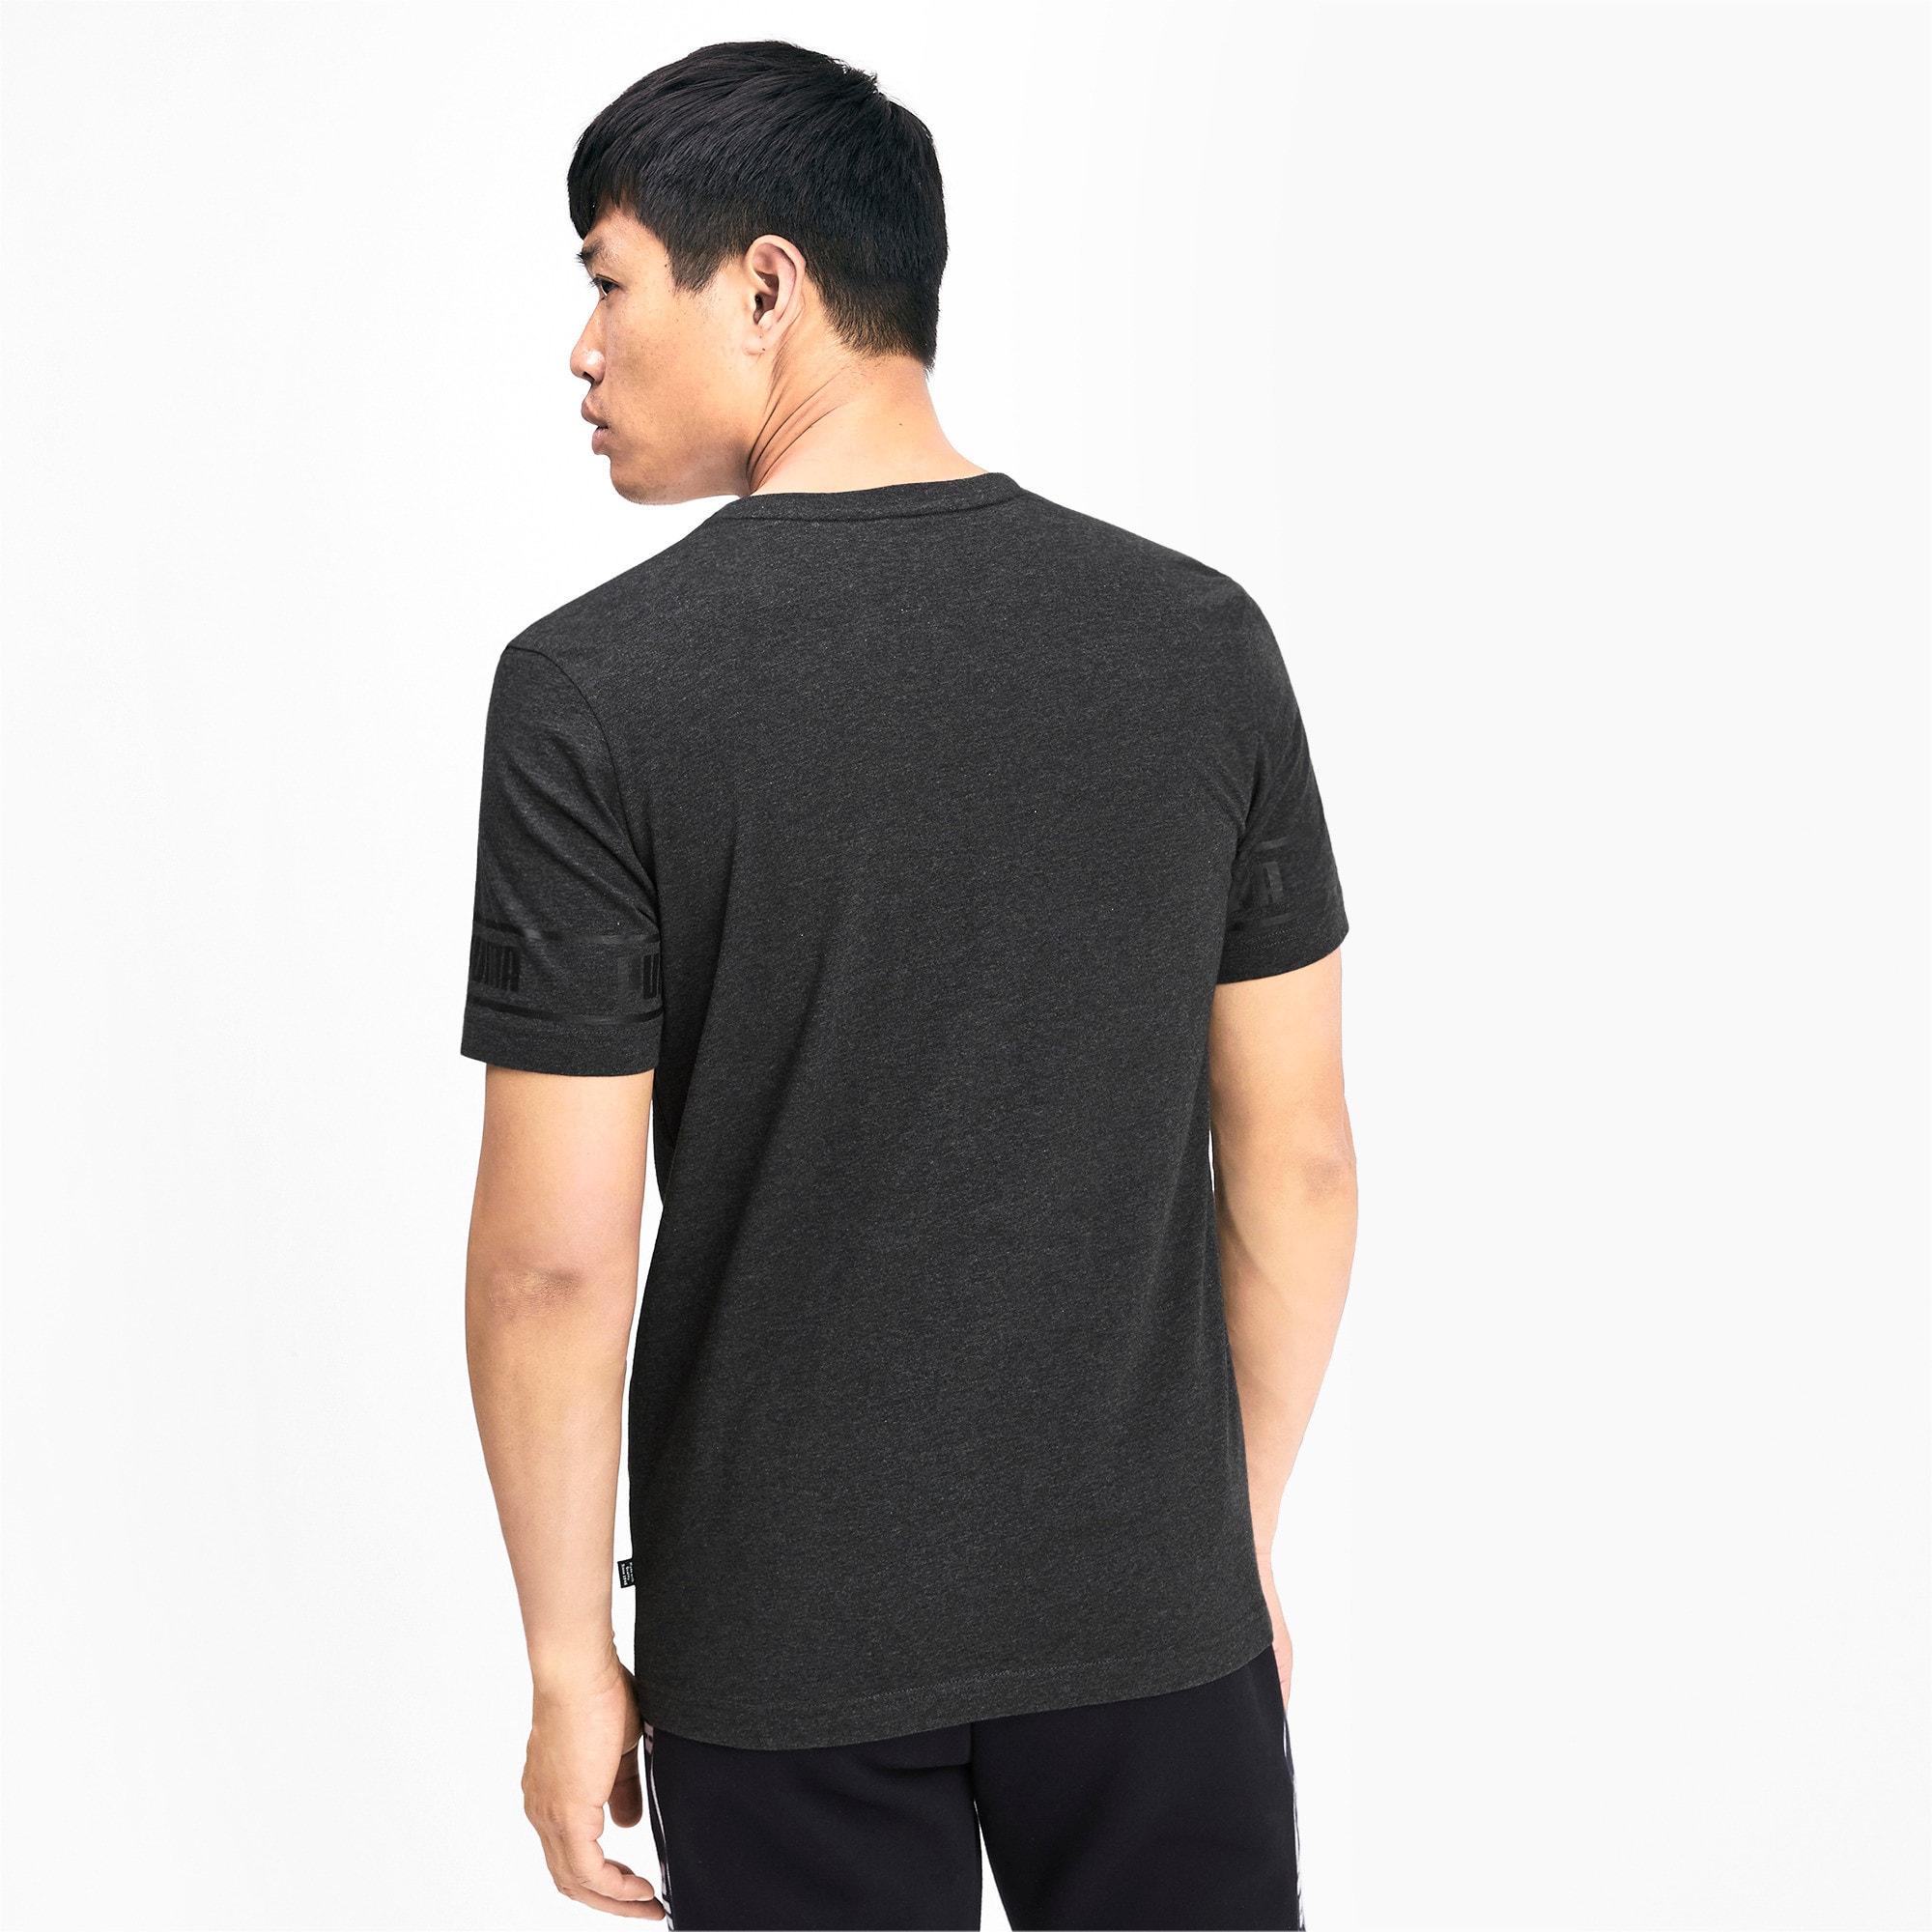 Miniaturka 2 Męska koszulka Amplified, Dark Gray Heather, średnie